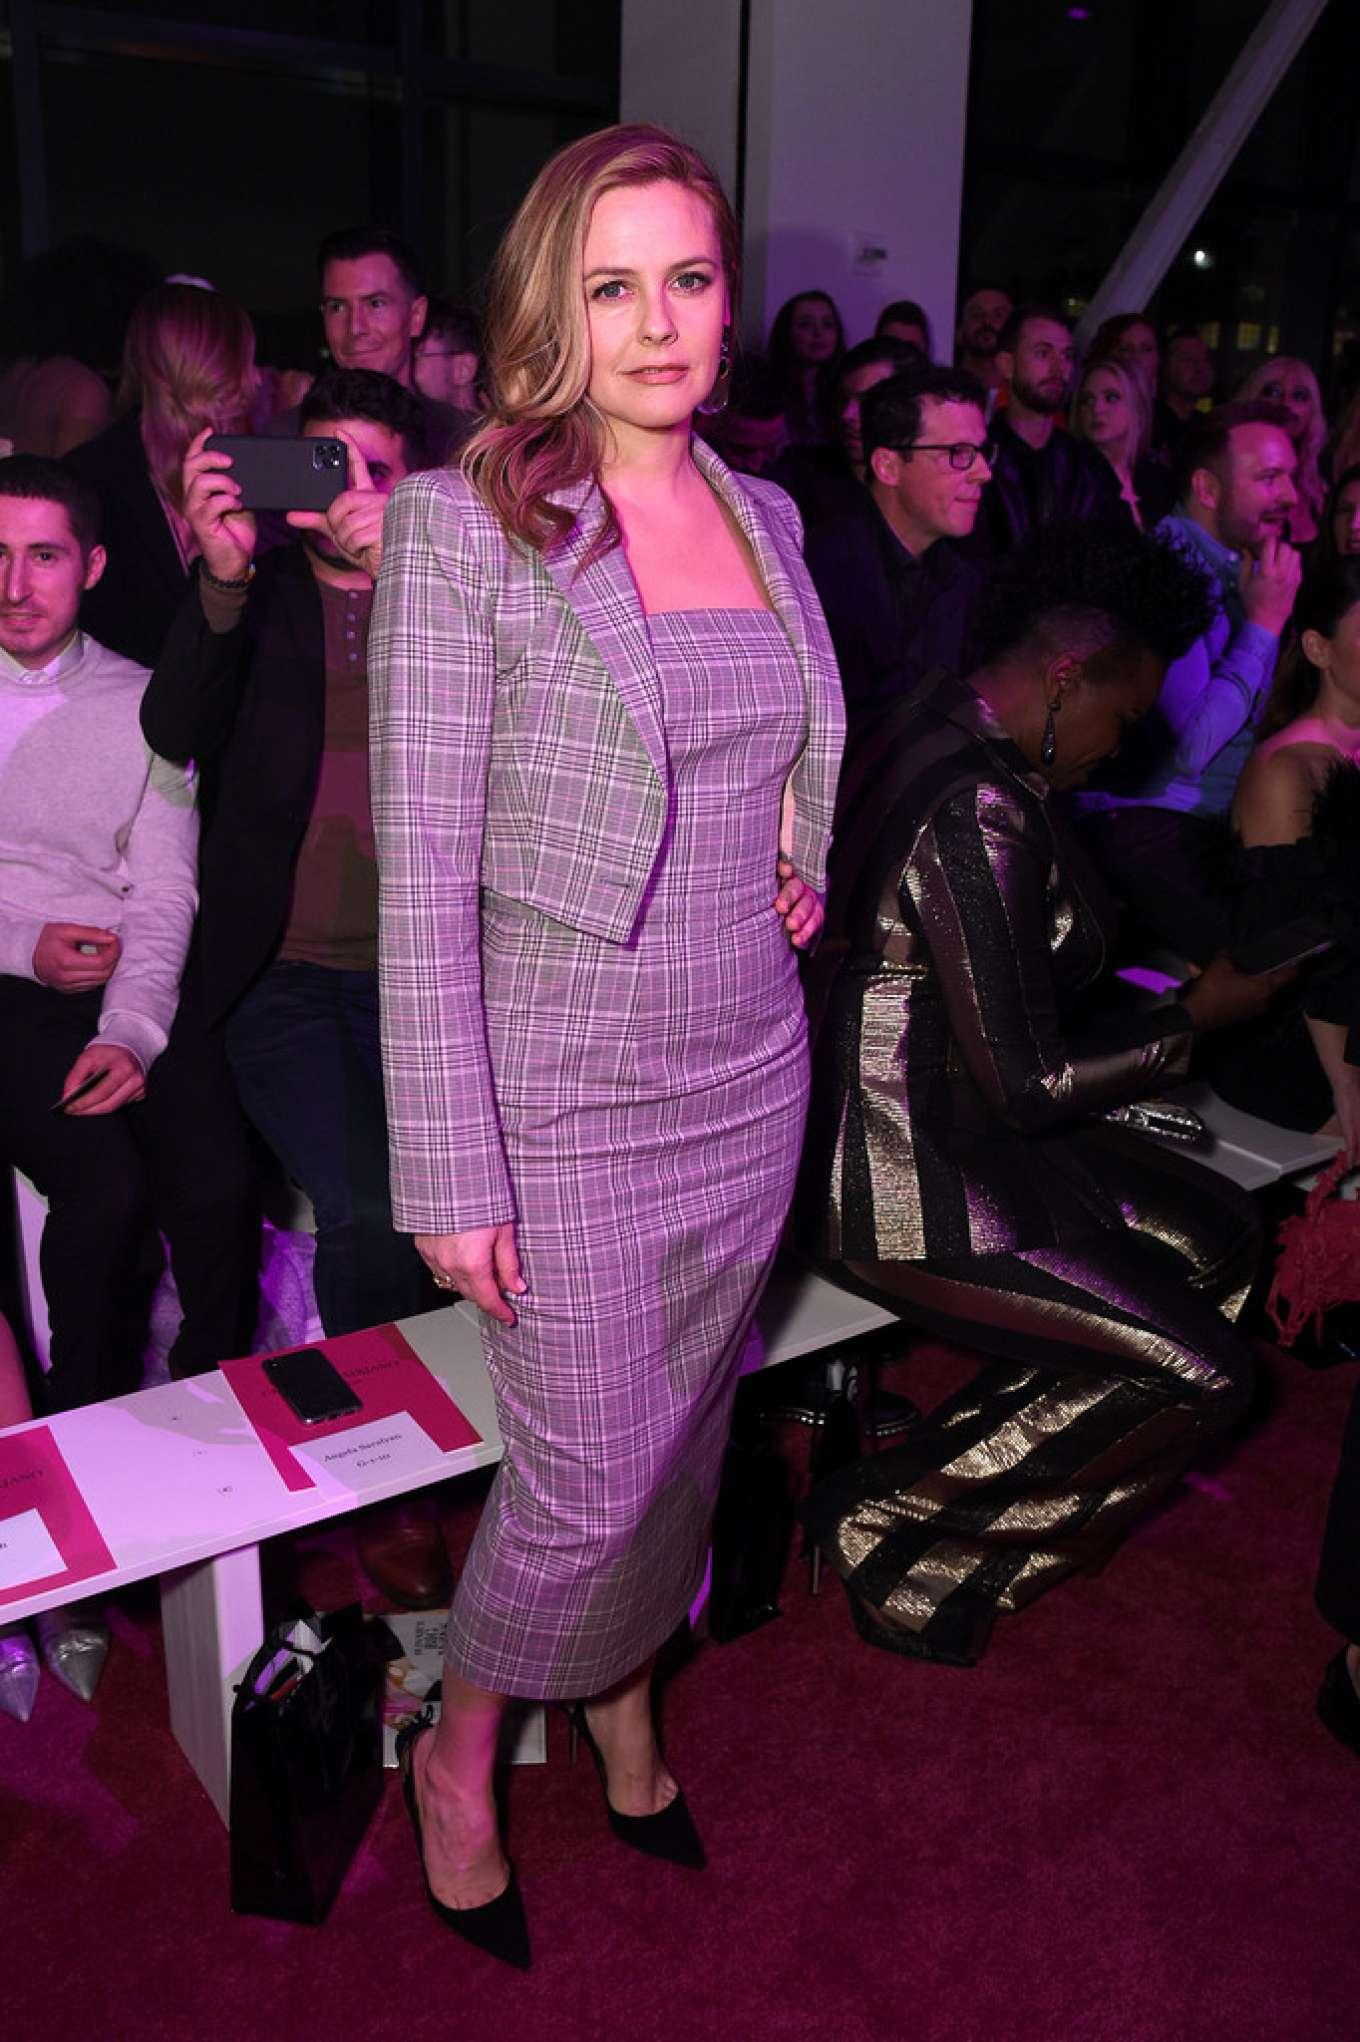 Alicia Silverstone 2020 : Alicia Silverstone – Christian Siriano Show at New York Fashion Week 2020-09